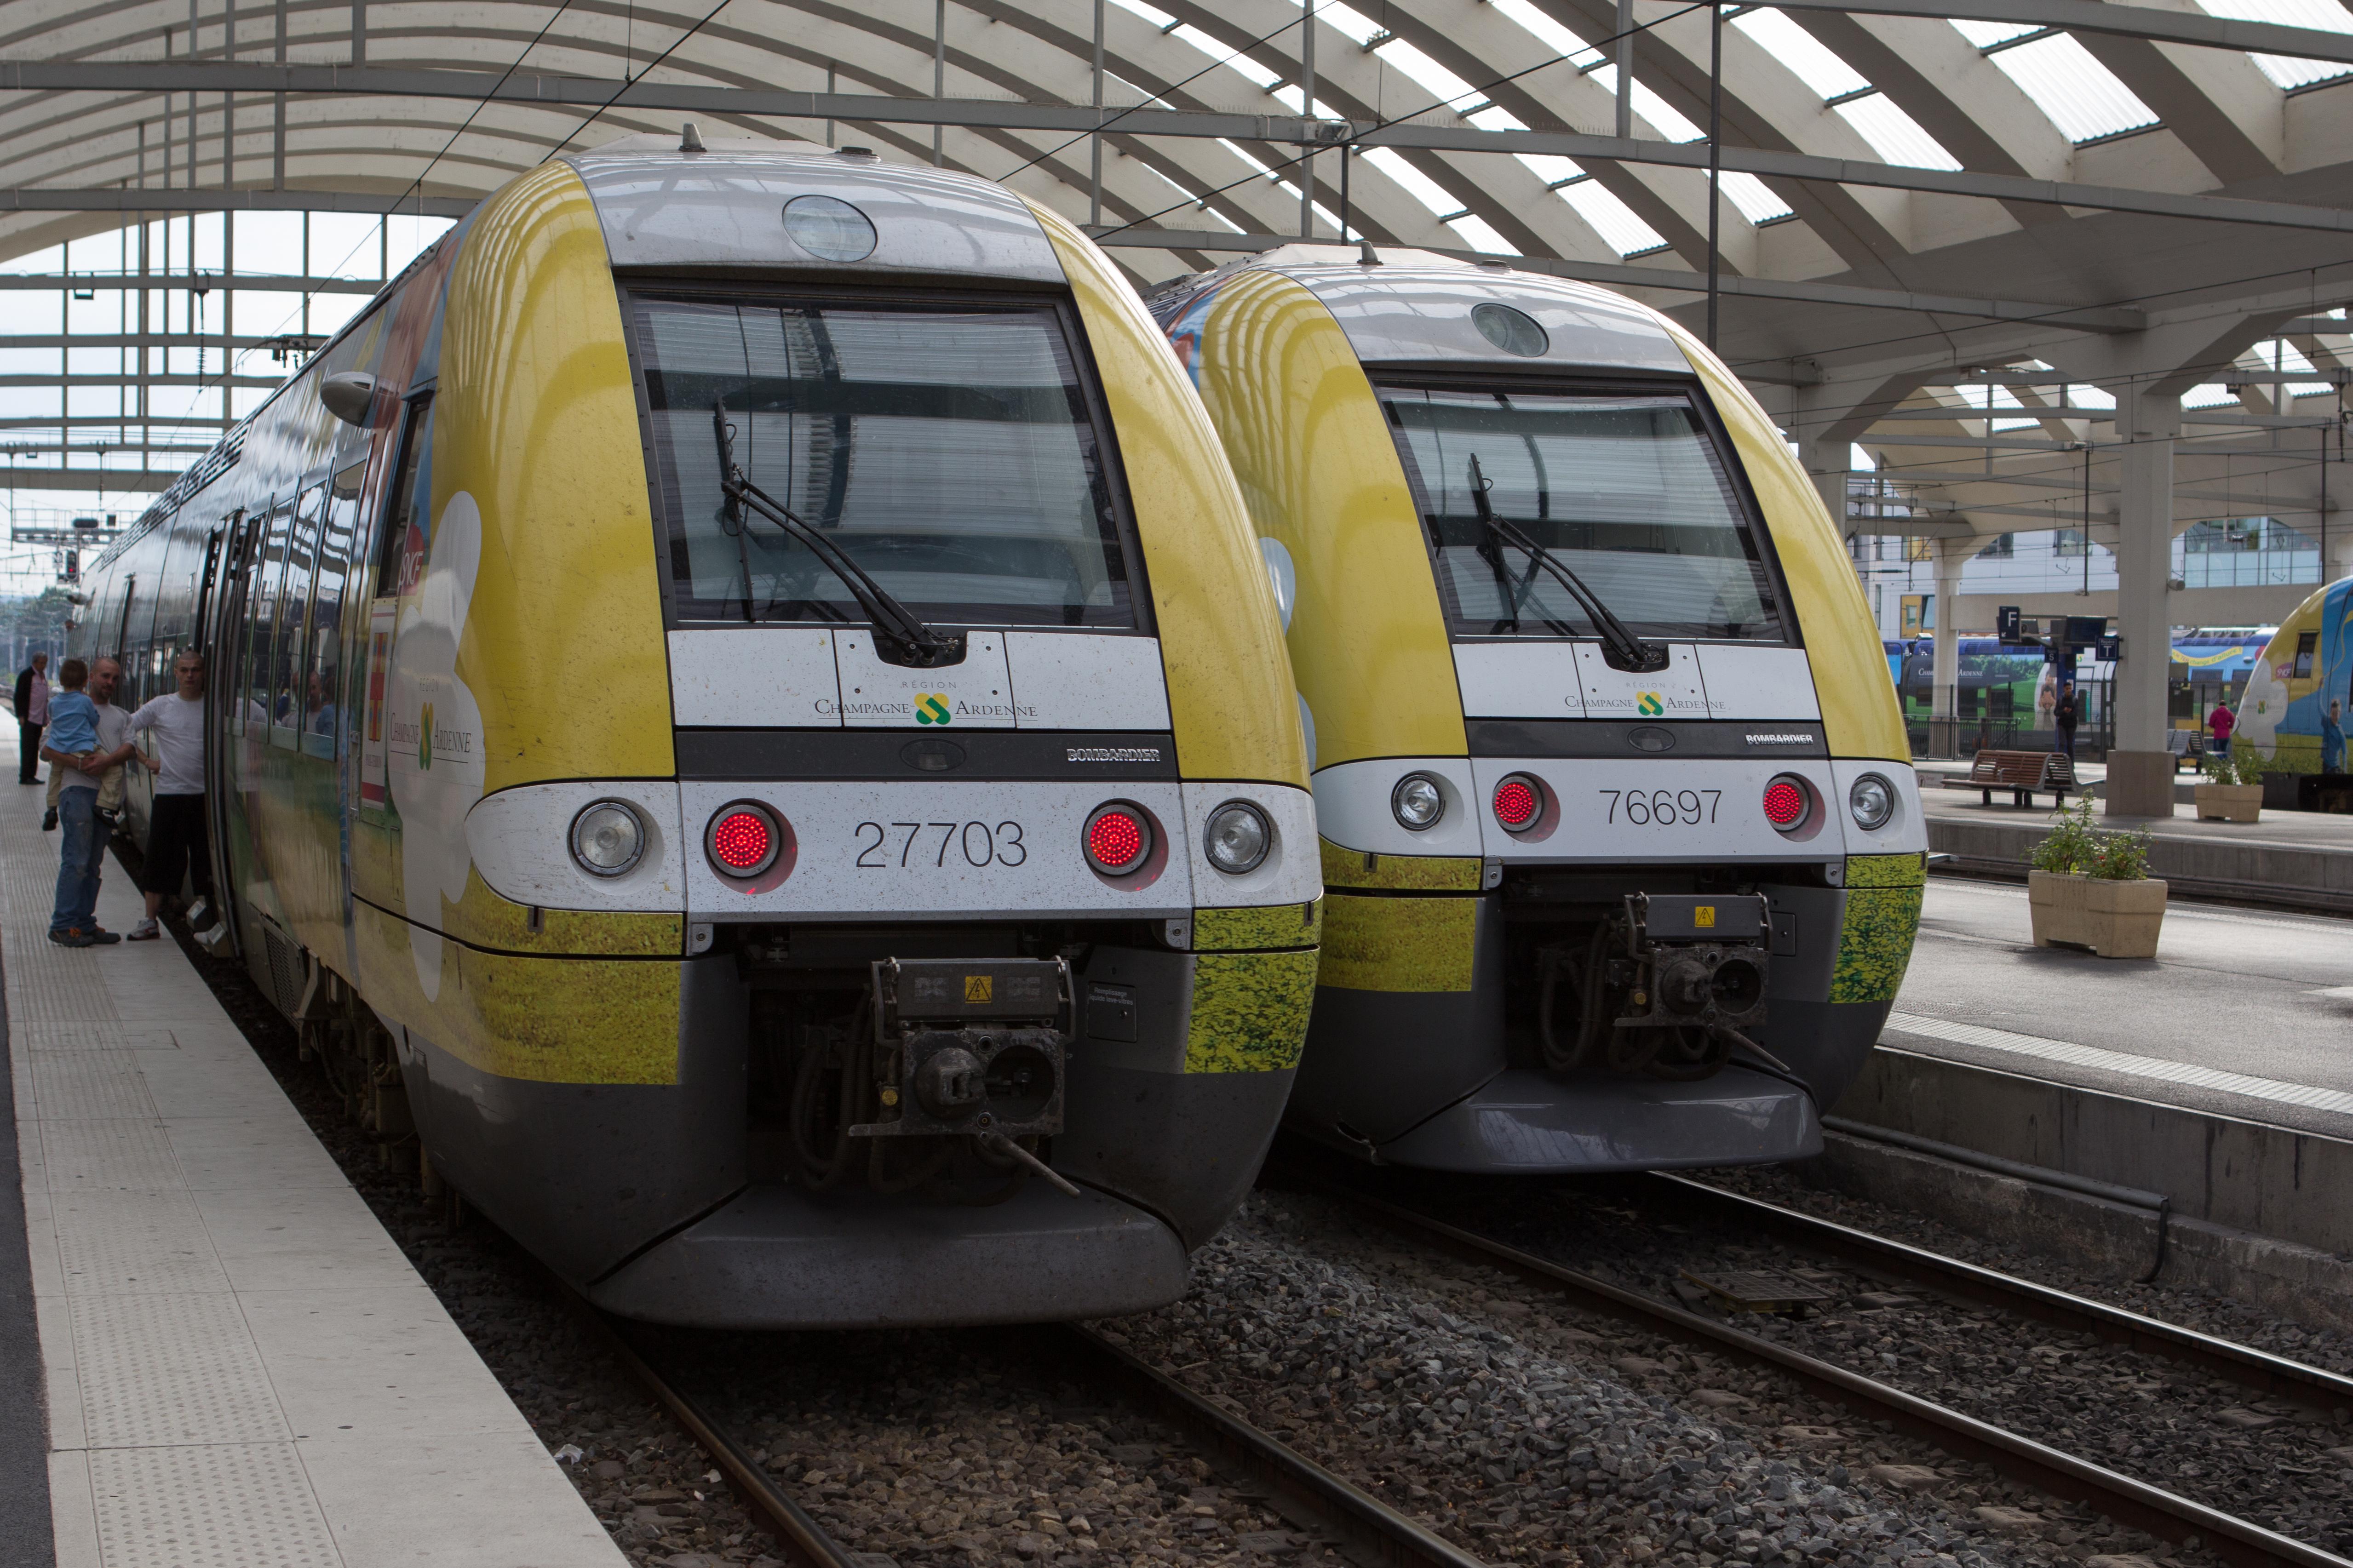 File:Gare de Reims - IMG 2378.jpg